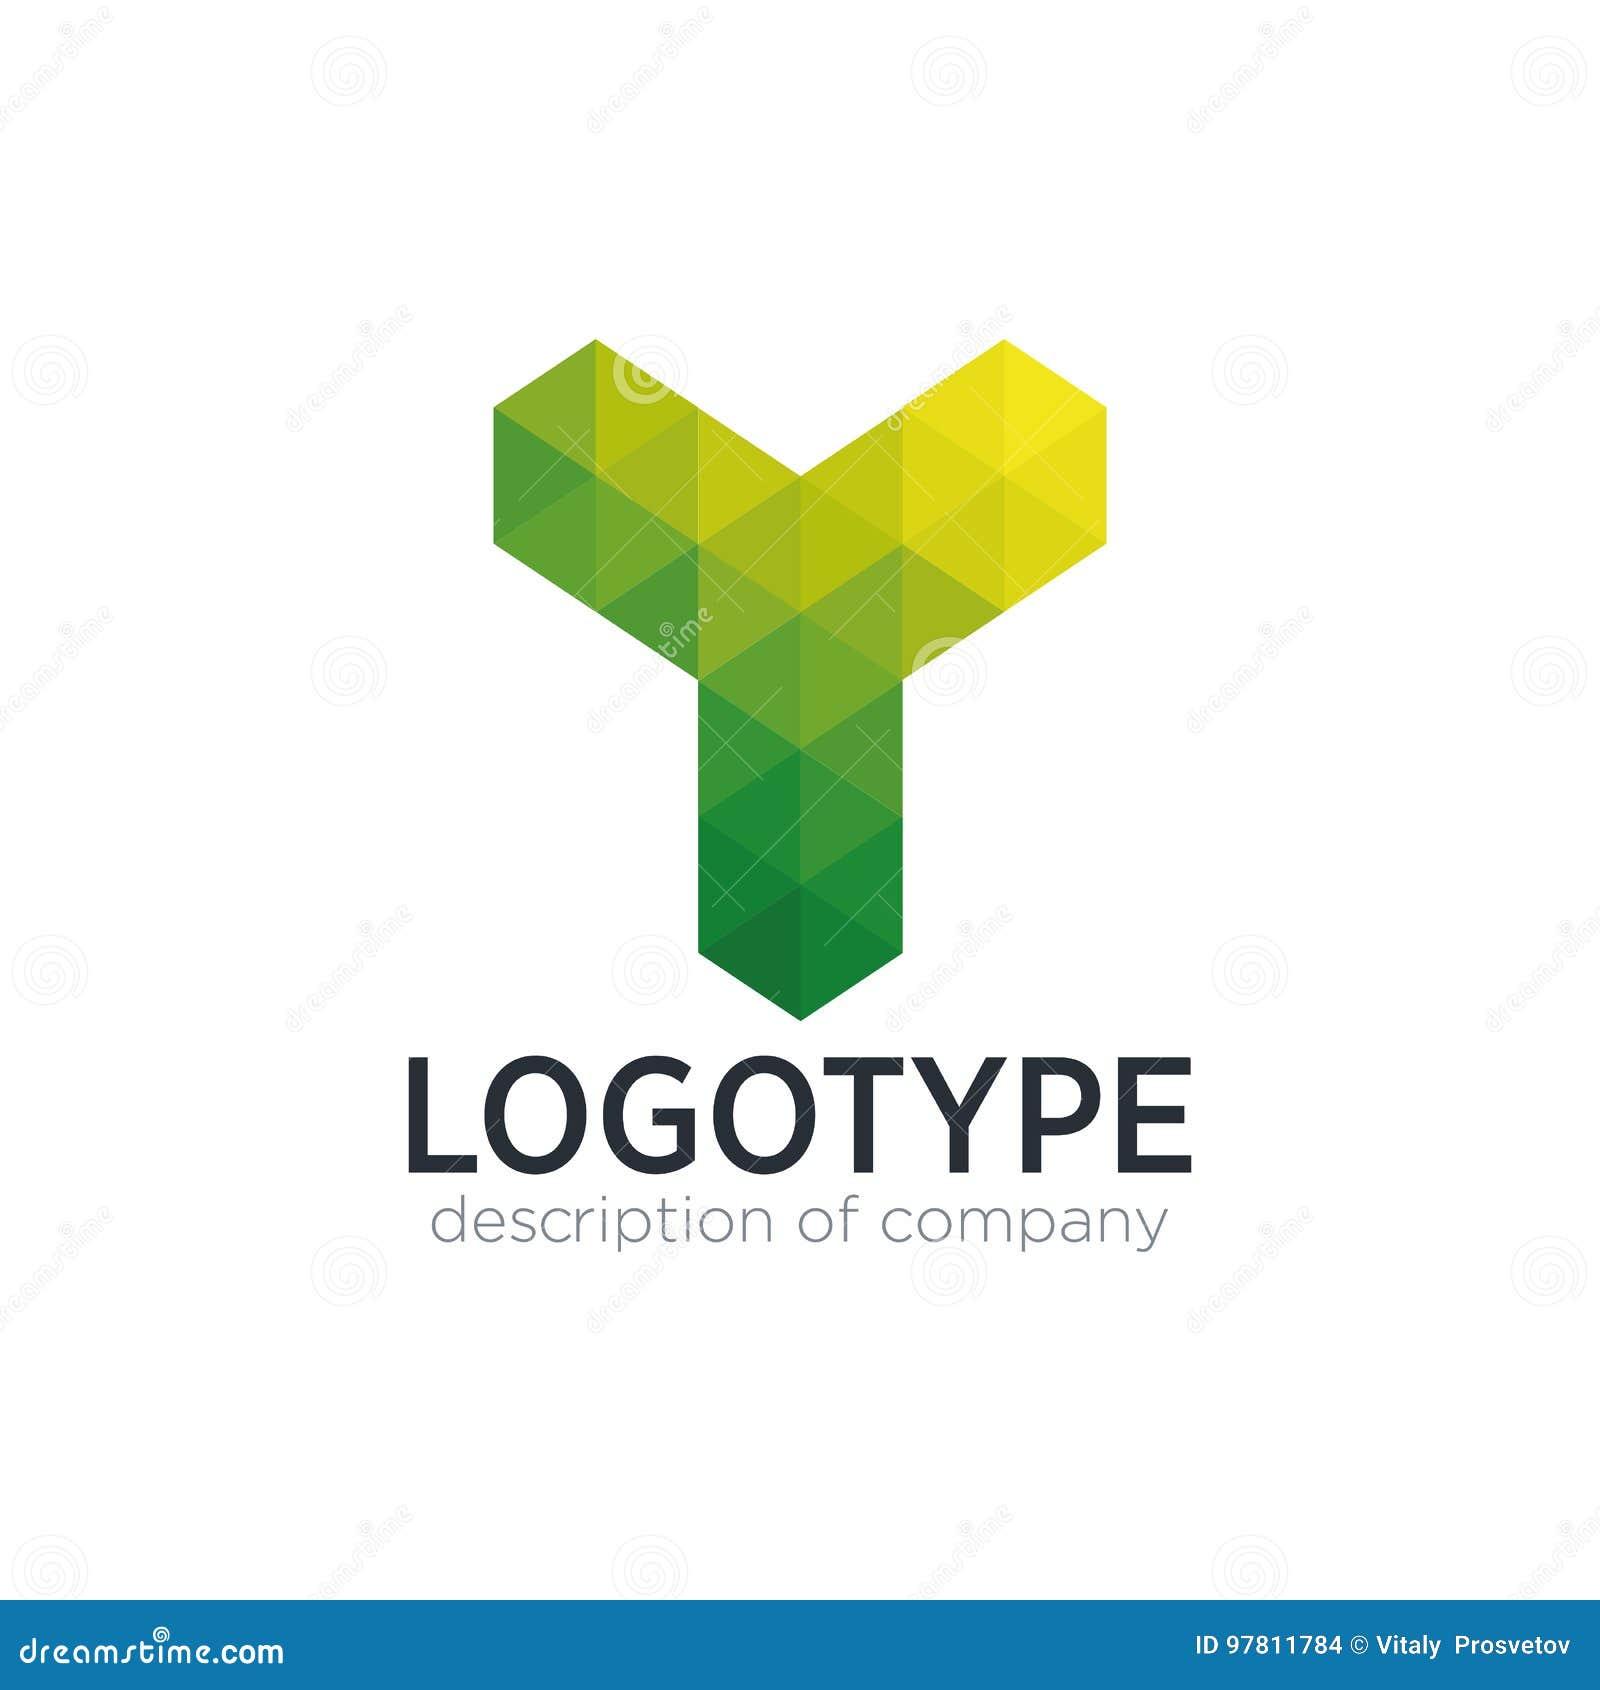 Abstract trend polygon letter y logo design template stock download abstract trend polygon letter y logo design template stock illustration illustration of logo maxwellsz